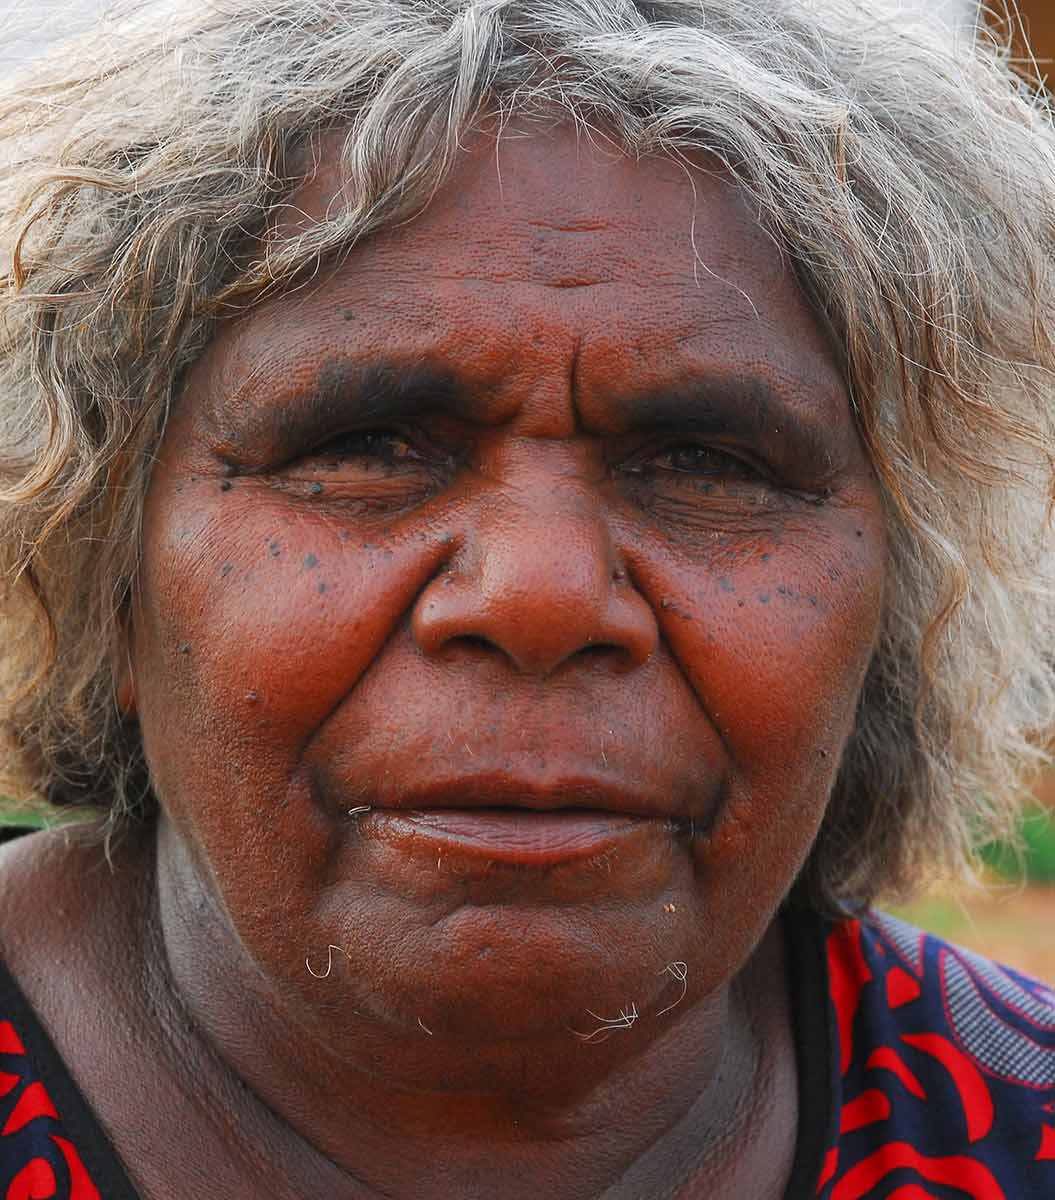 Portrait of Ngamayu Ngamaru Bidu. - click to view larger image